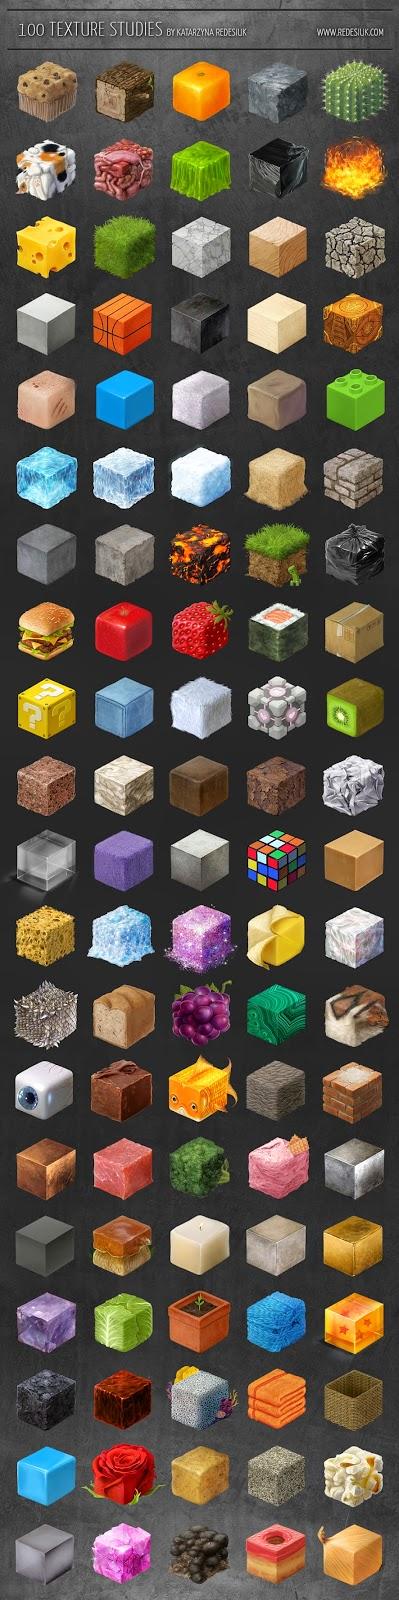 http://vesner.deviantart.com/art/100-texture-studies-360570335